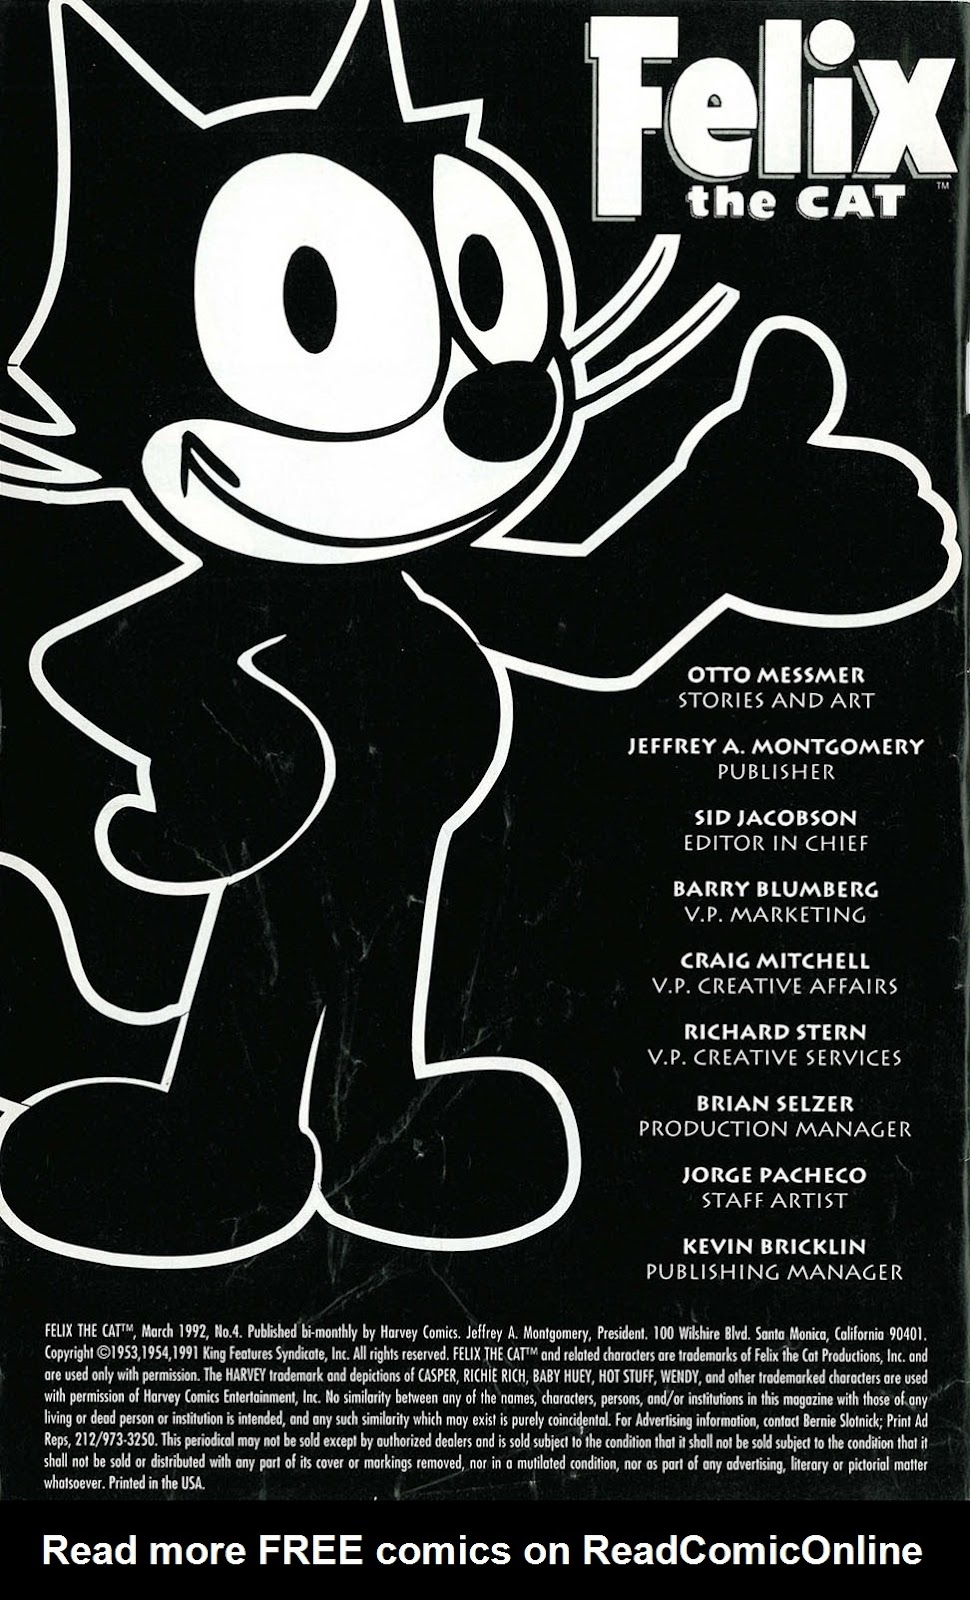 Read online Felix the Cat comic -  Issue #4 - 2